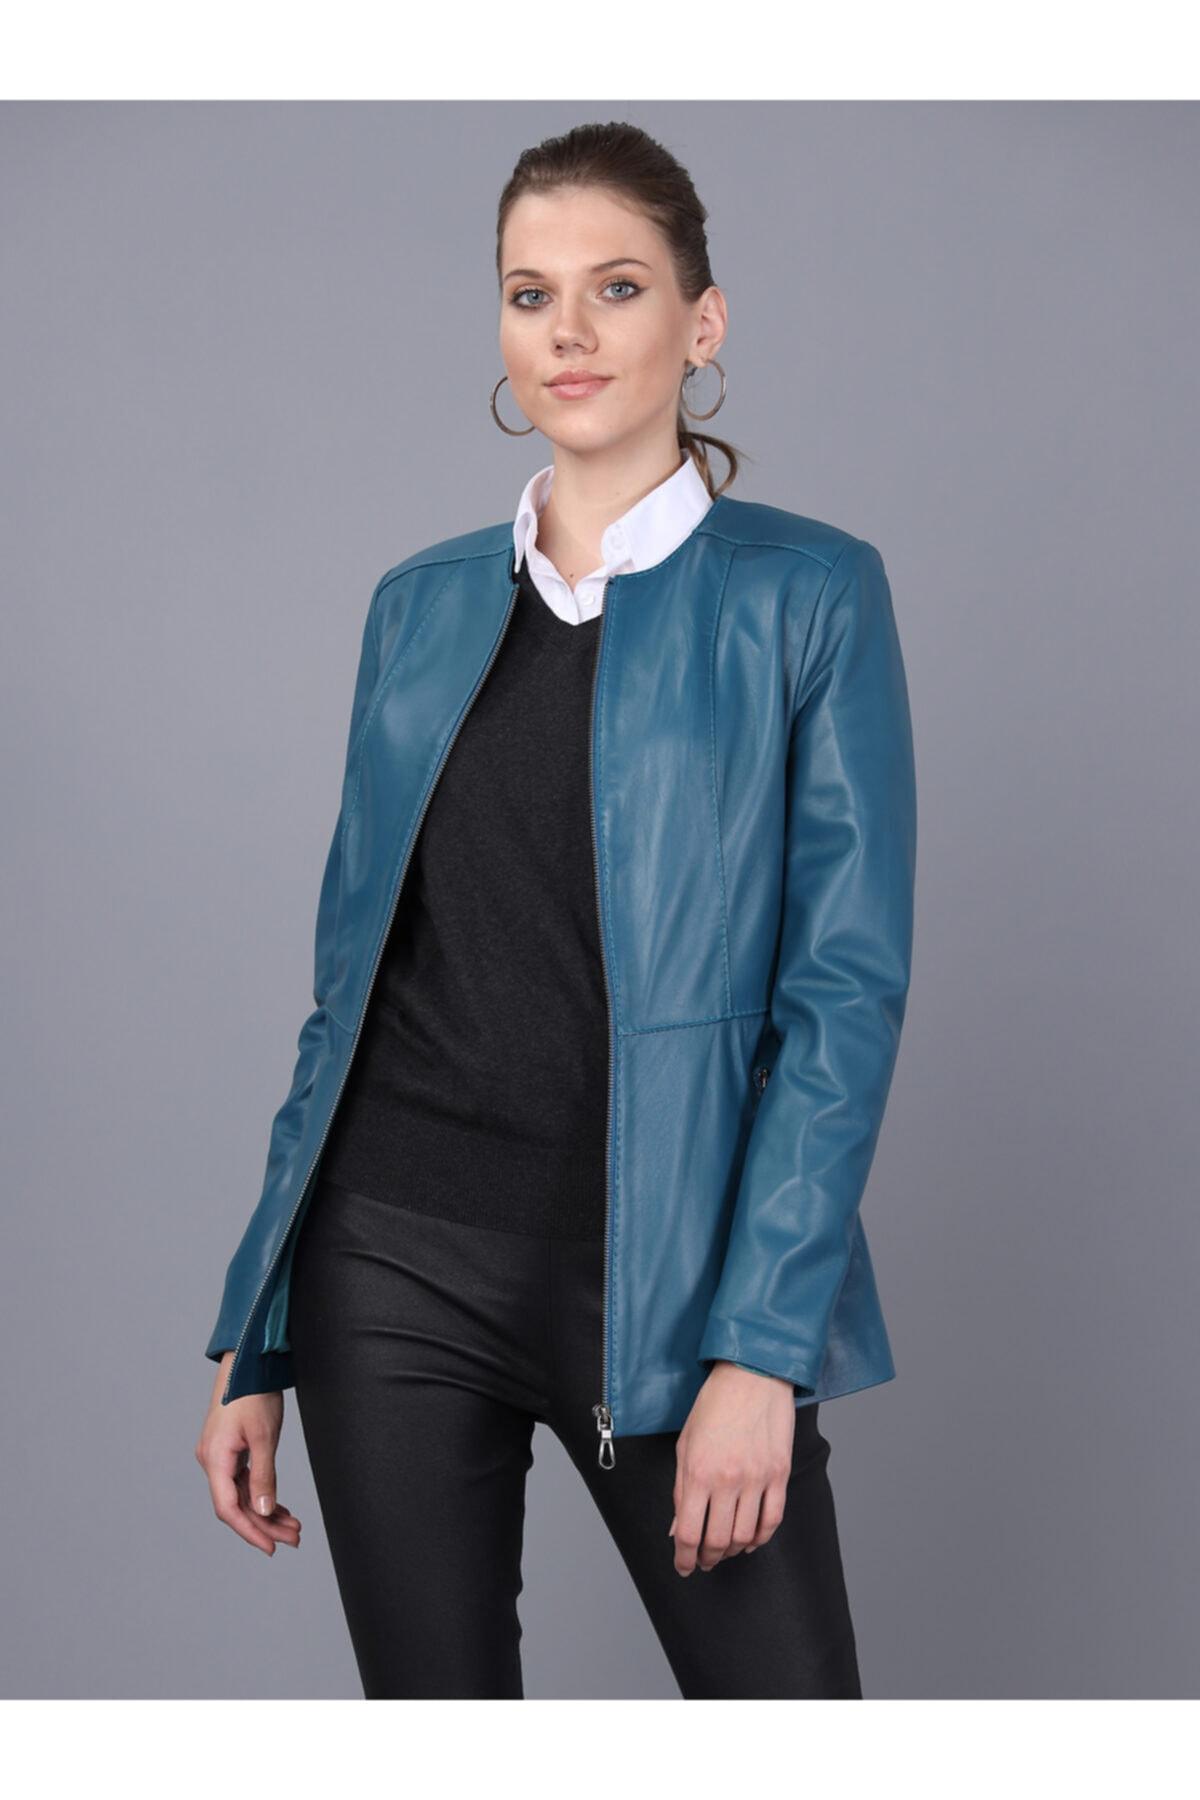 Basics&More Kadın Petrol Mavi Deri Ceket Bm03 1